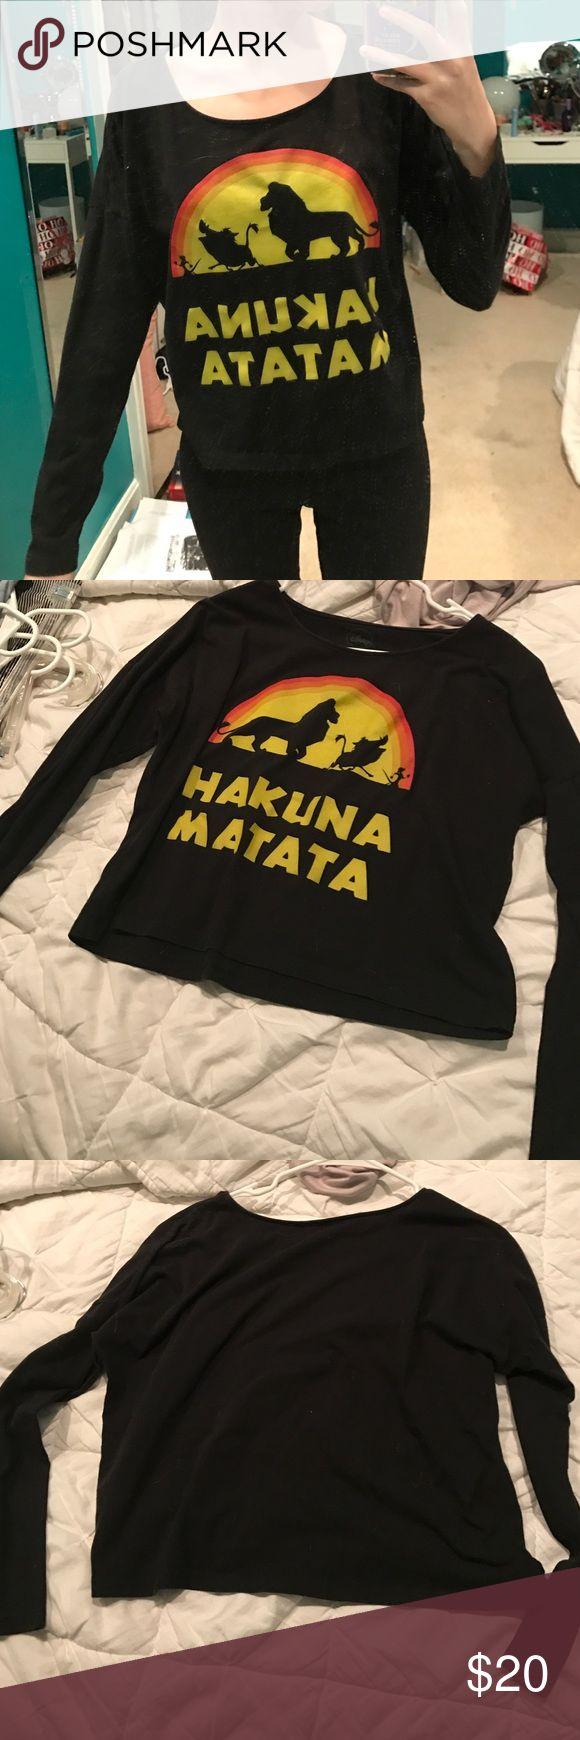 Hakuna matata T-shirt Black hakuna matata long sleeve t shirt worn once in brand new condition fit slightly cropped Disney Tops Tees - Long Sleeve